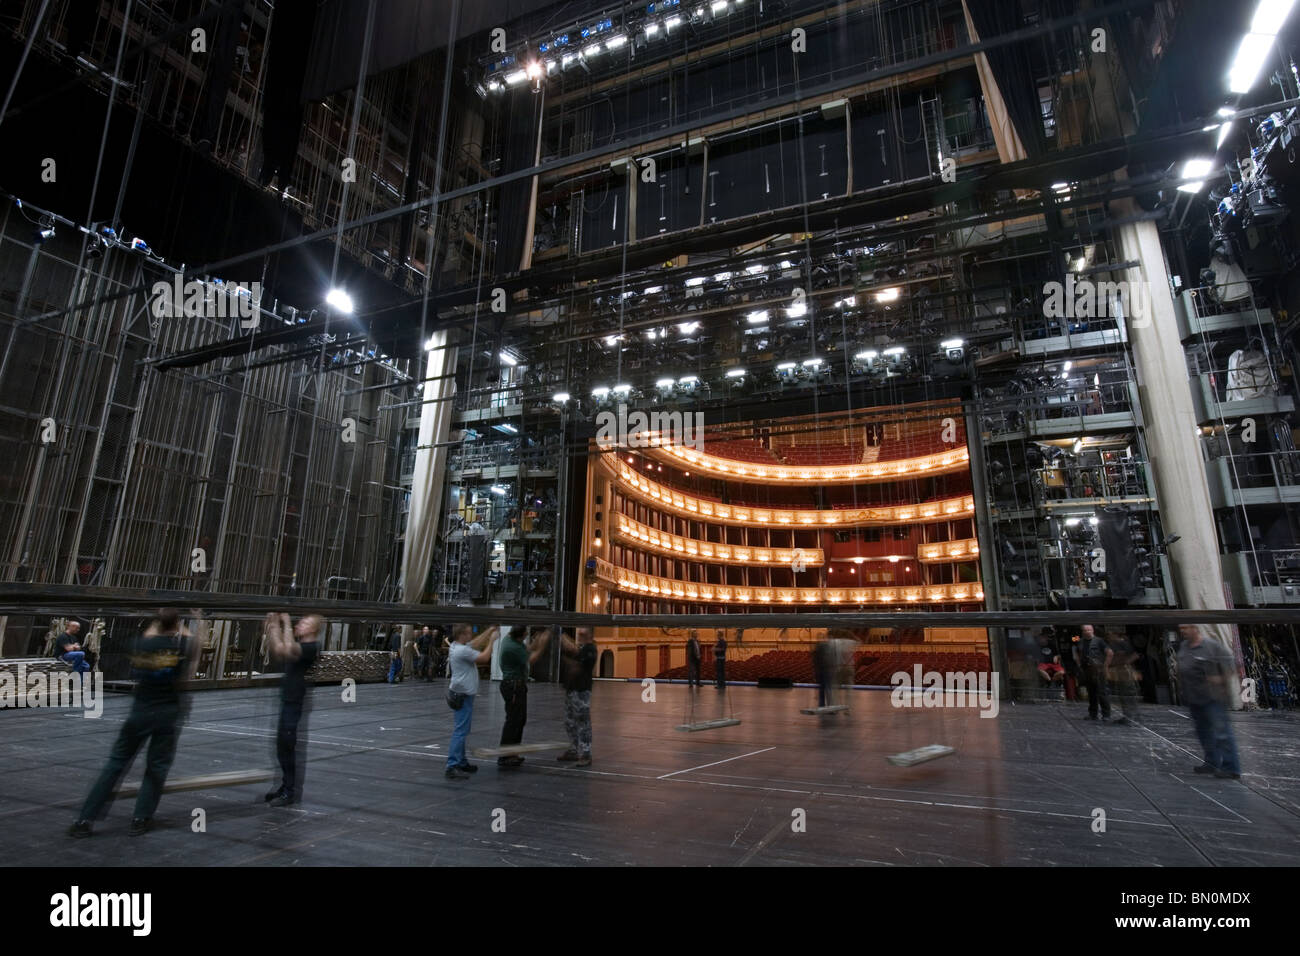 Vienna Opera Backstage, Austria - Stock Image